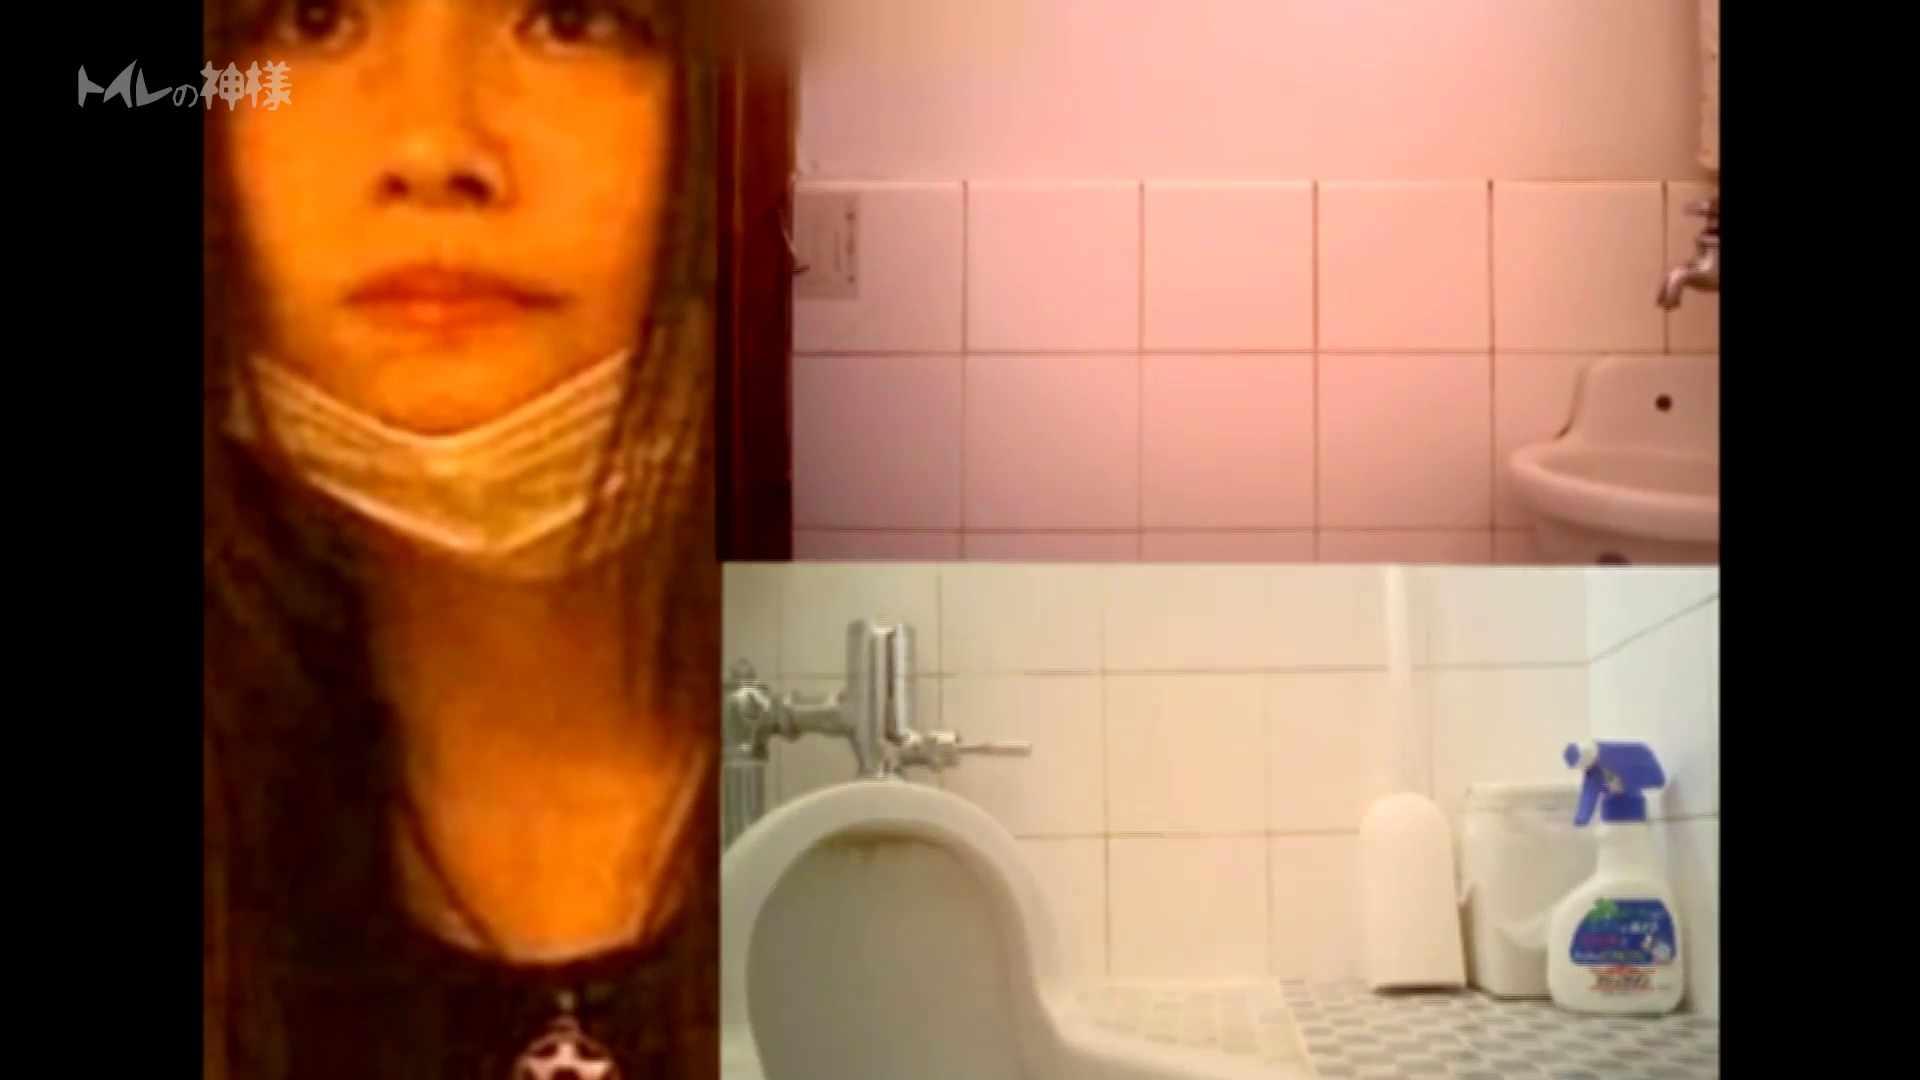 Vol.02 花の女子大生うんこ盗撮2 色っぽい女子大生 AV無料動画キャプチャ 82pic 78